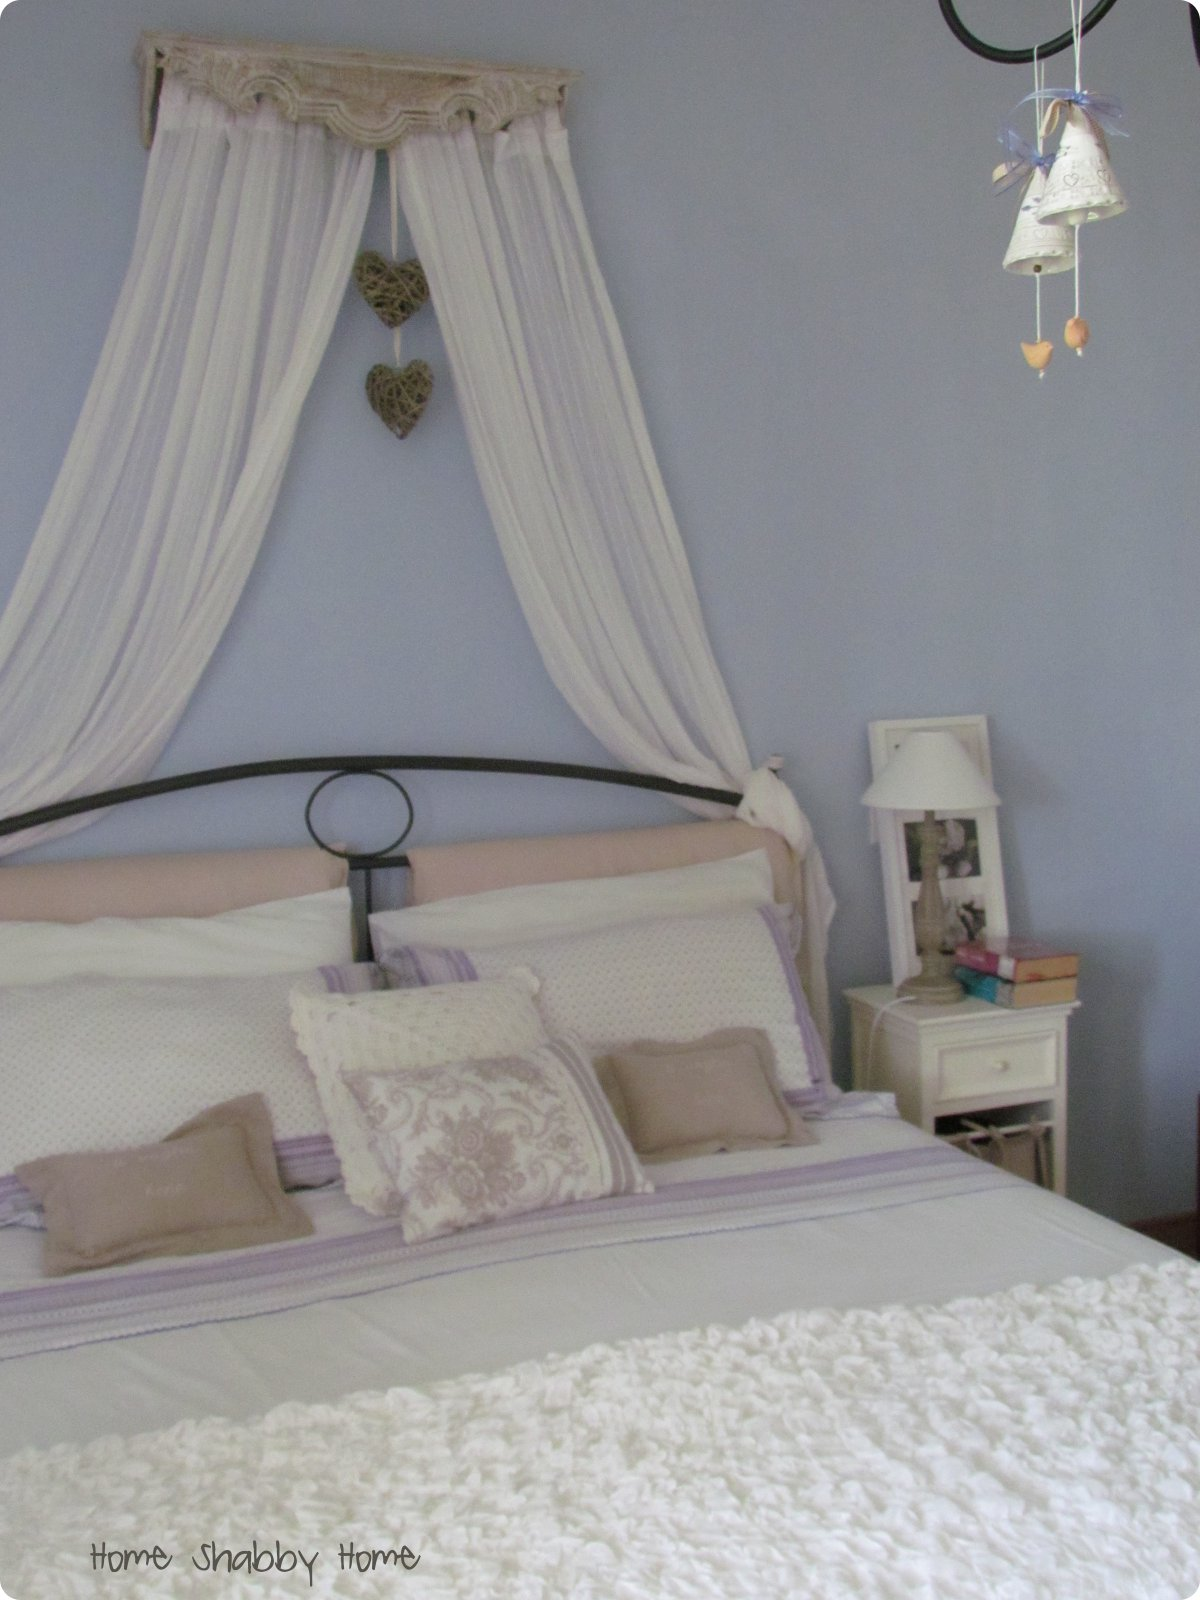 my bedroom home shabby home arredamento interior craft. Black Bedroom Furniture Sets. Home Design Ideas